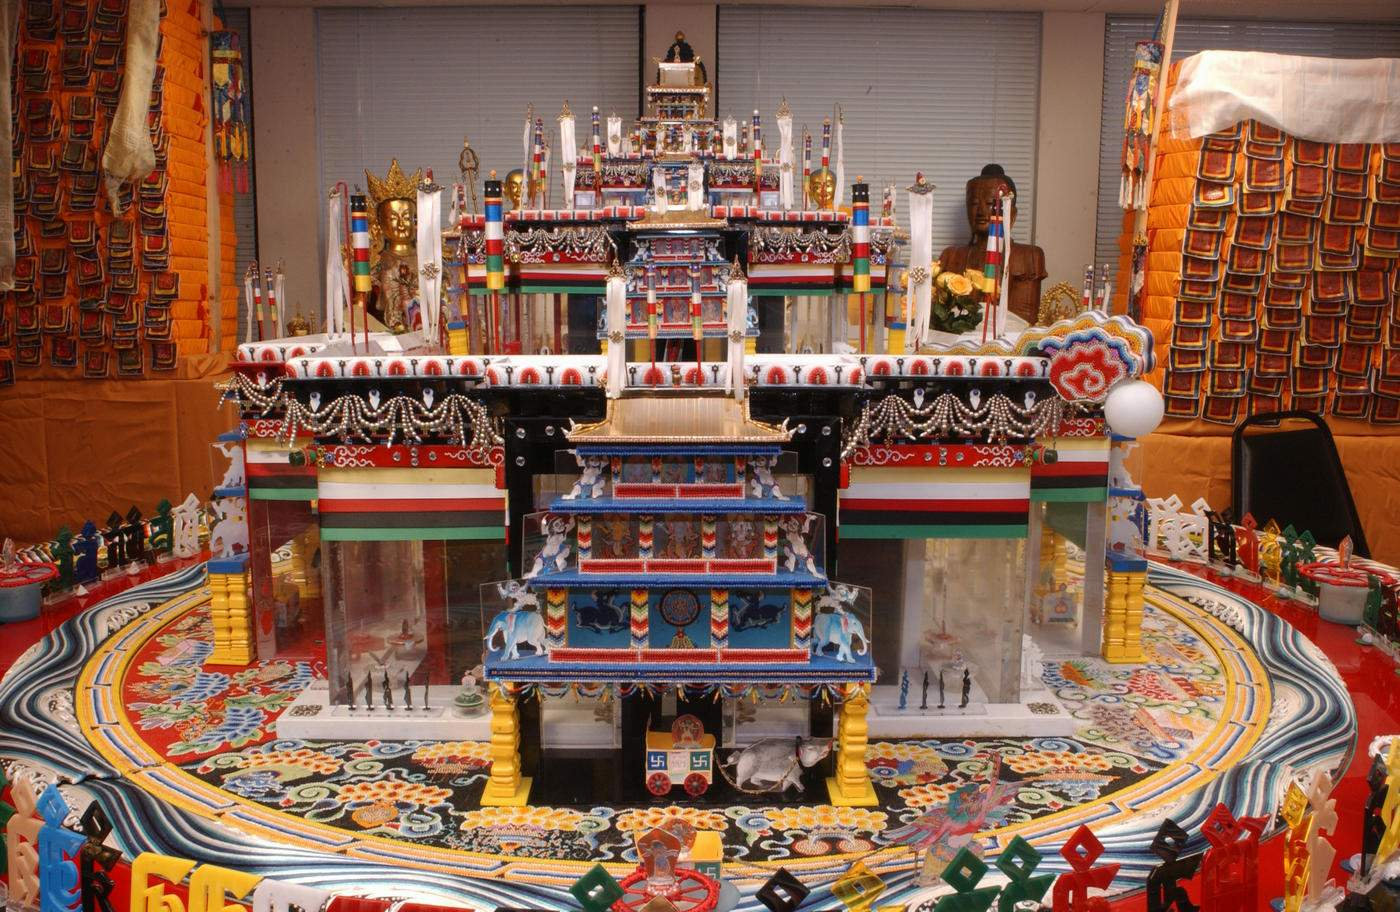 Architectural model of the Kalachakra mandala